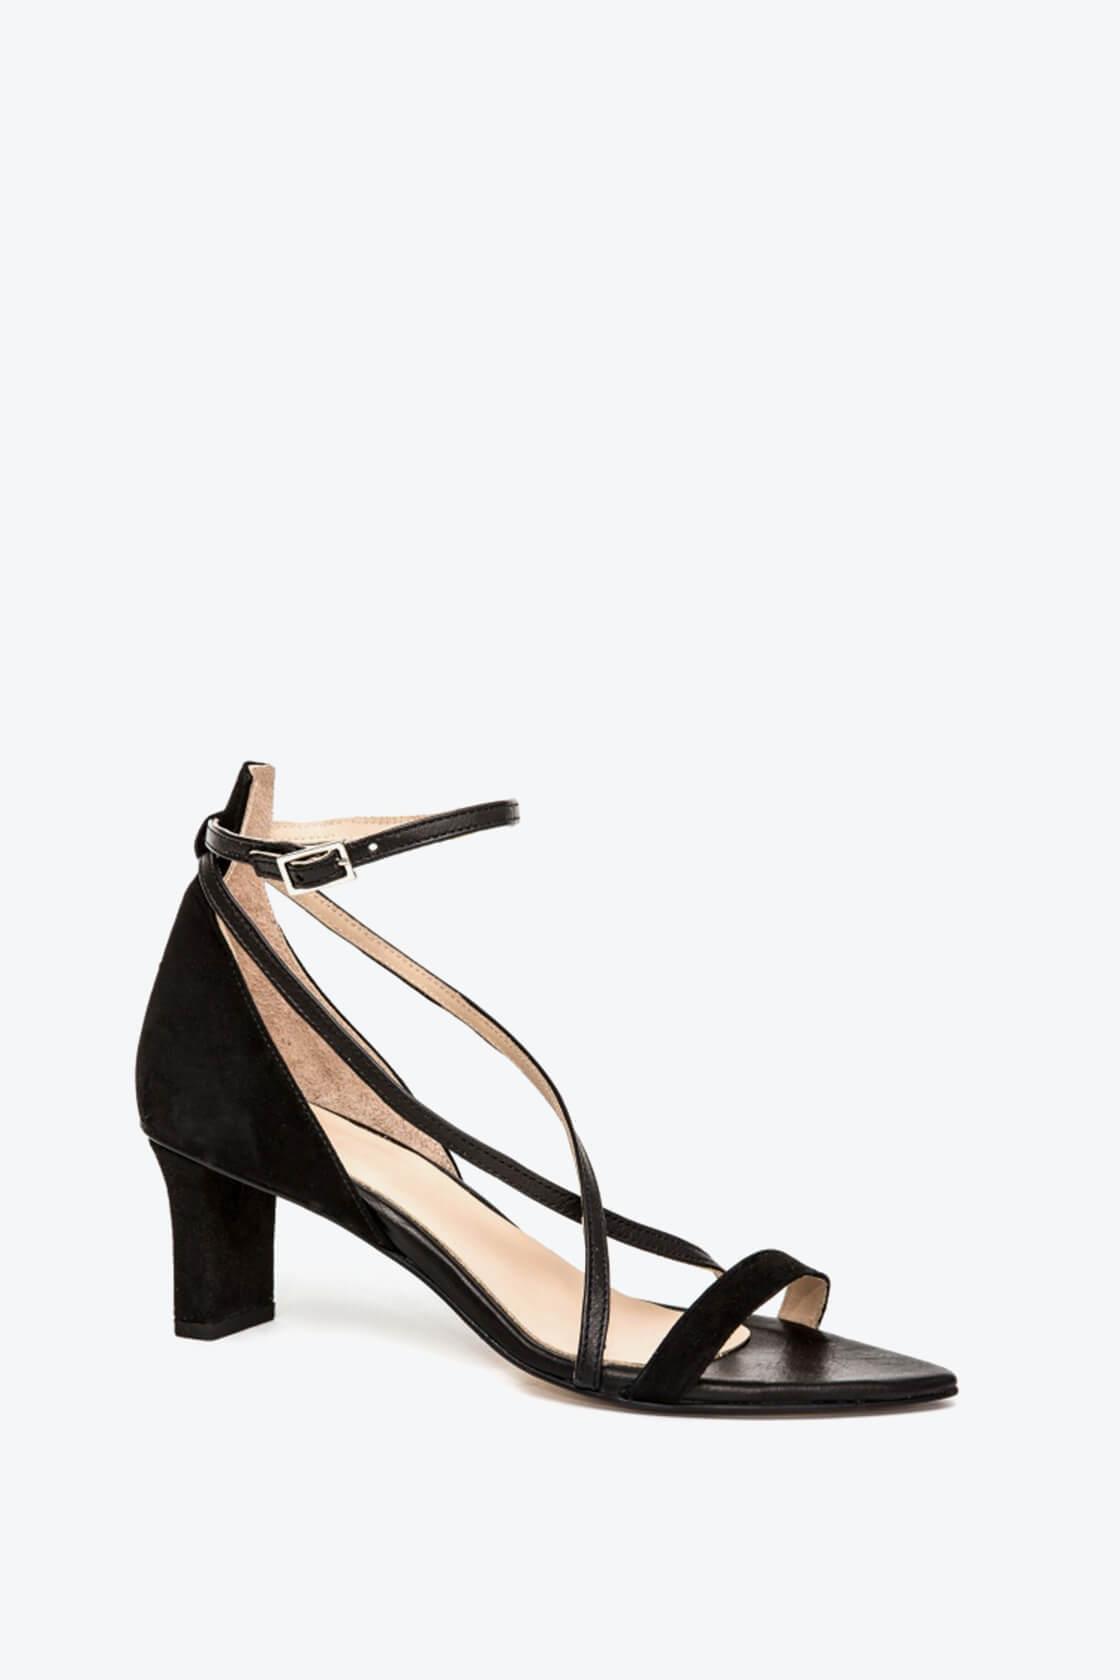 EJK0000007 Maggie strappy sandals black 1